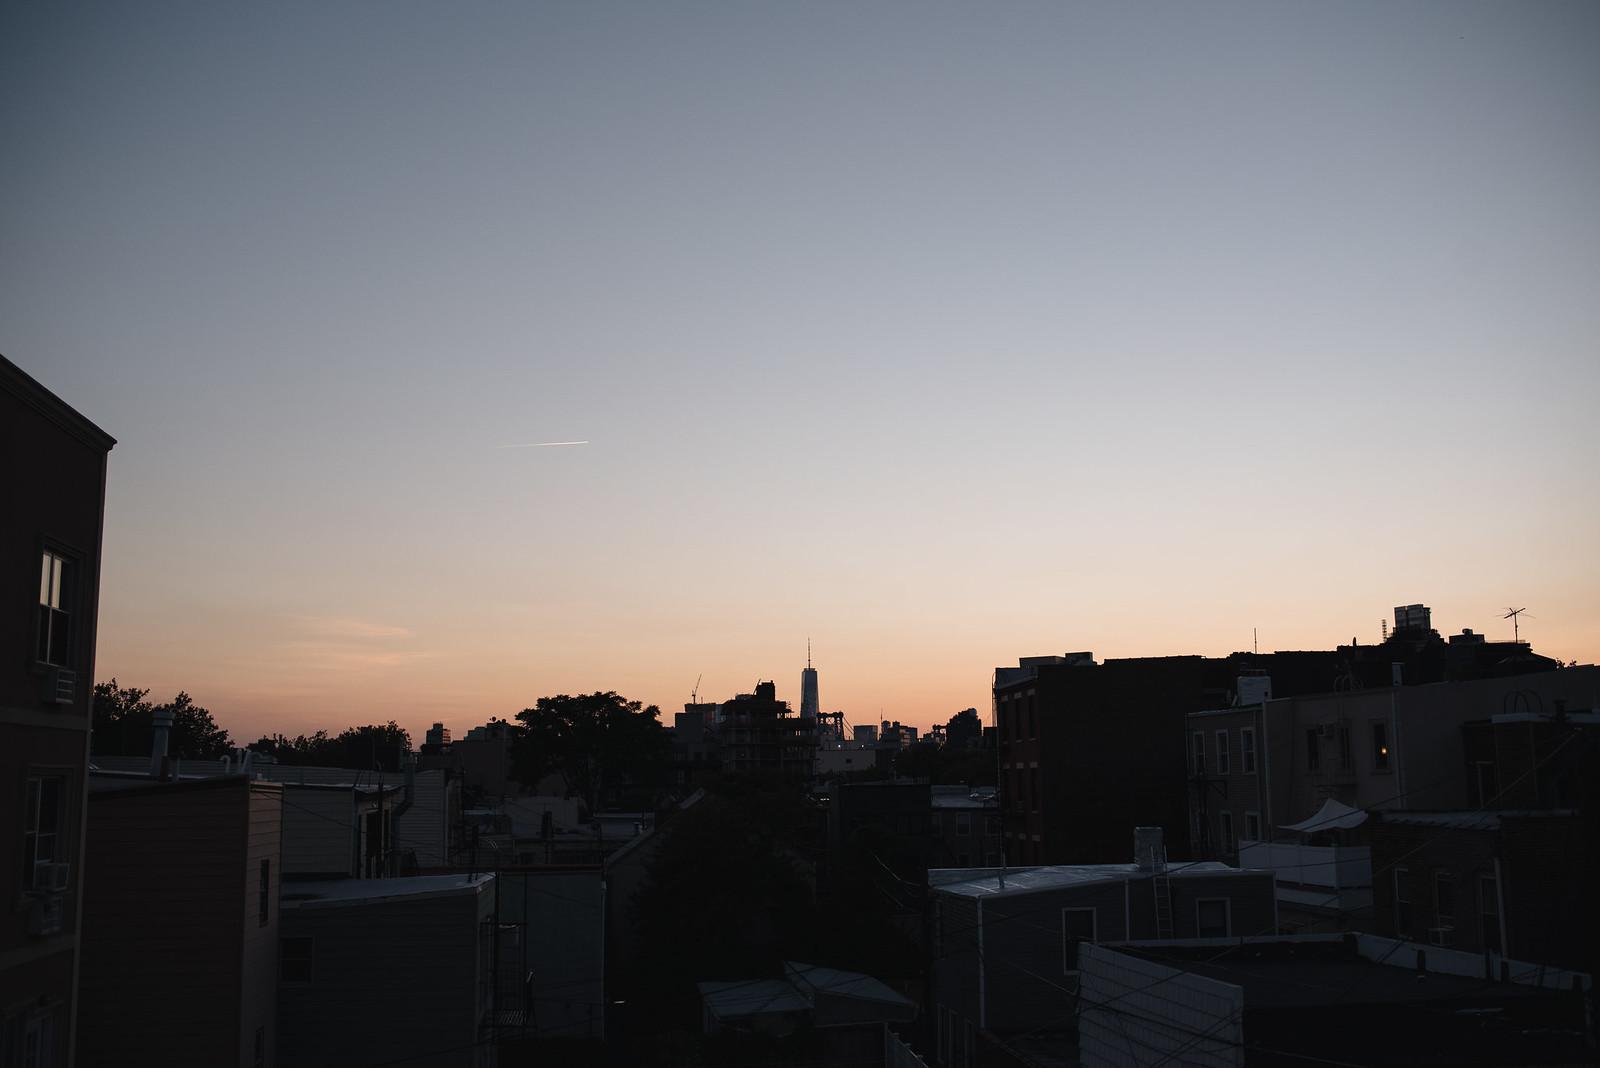 Brooklyn Rooftop on juliettelaura.blogspot.com